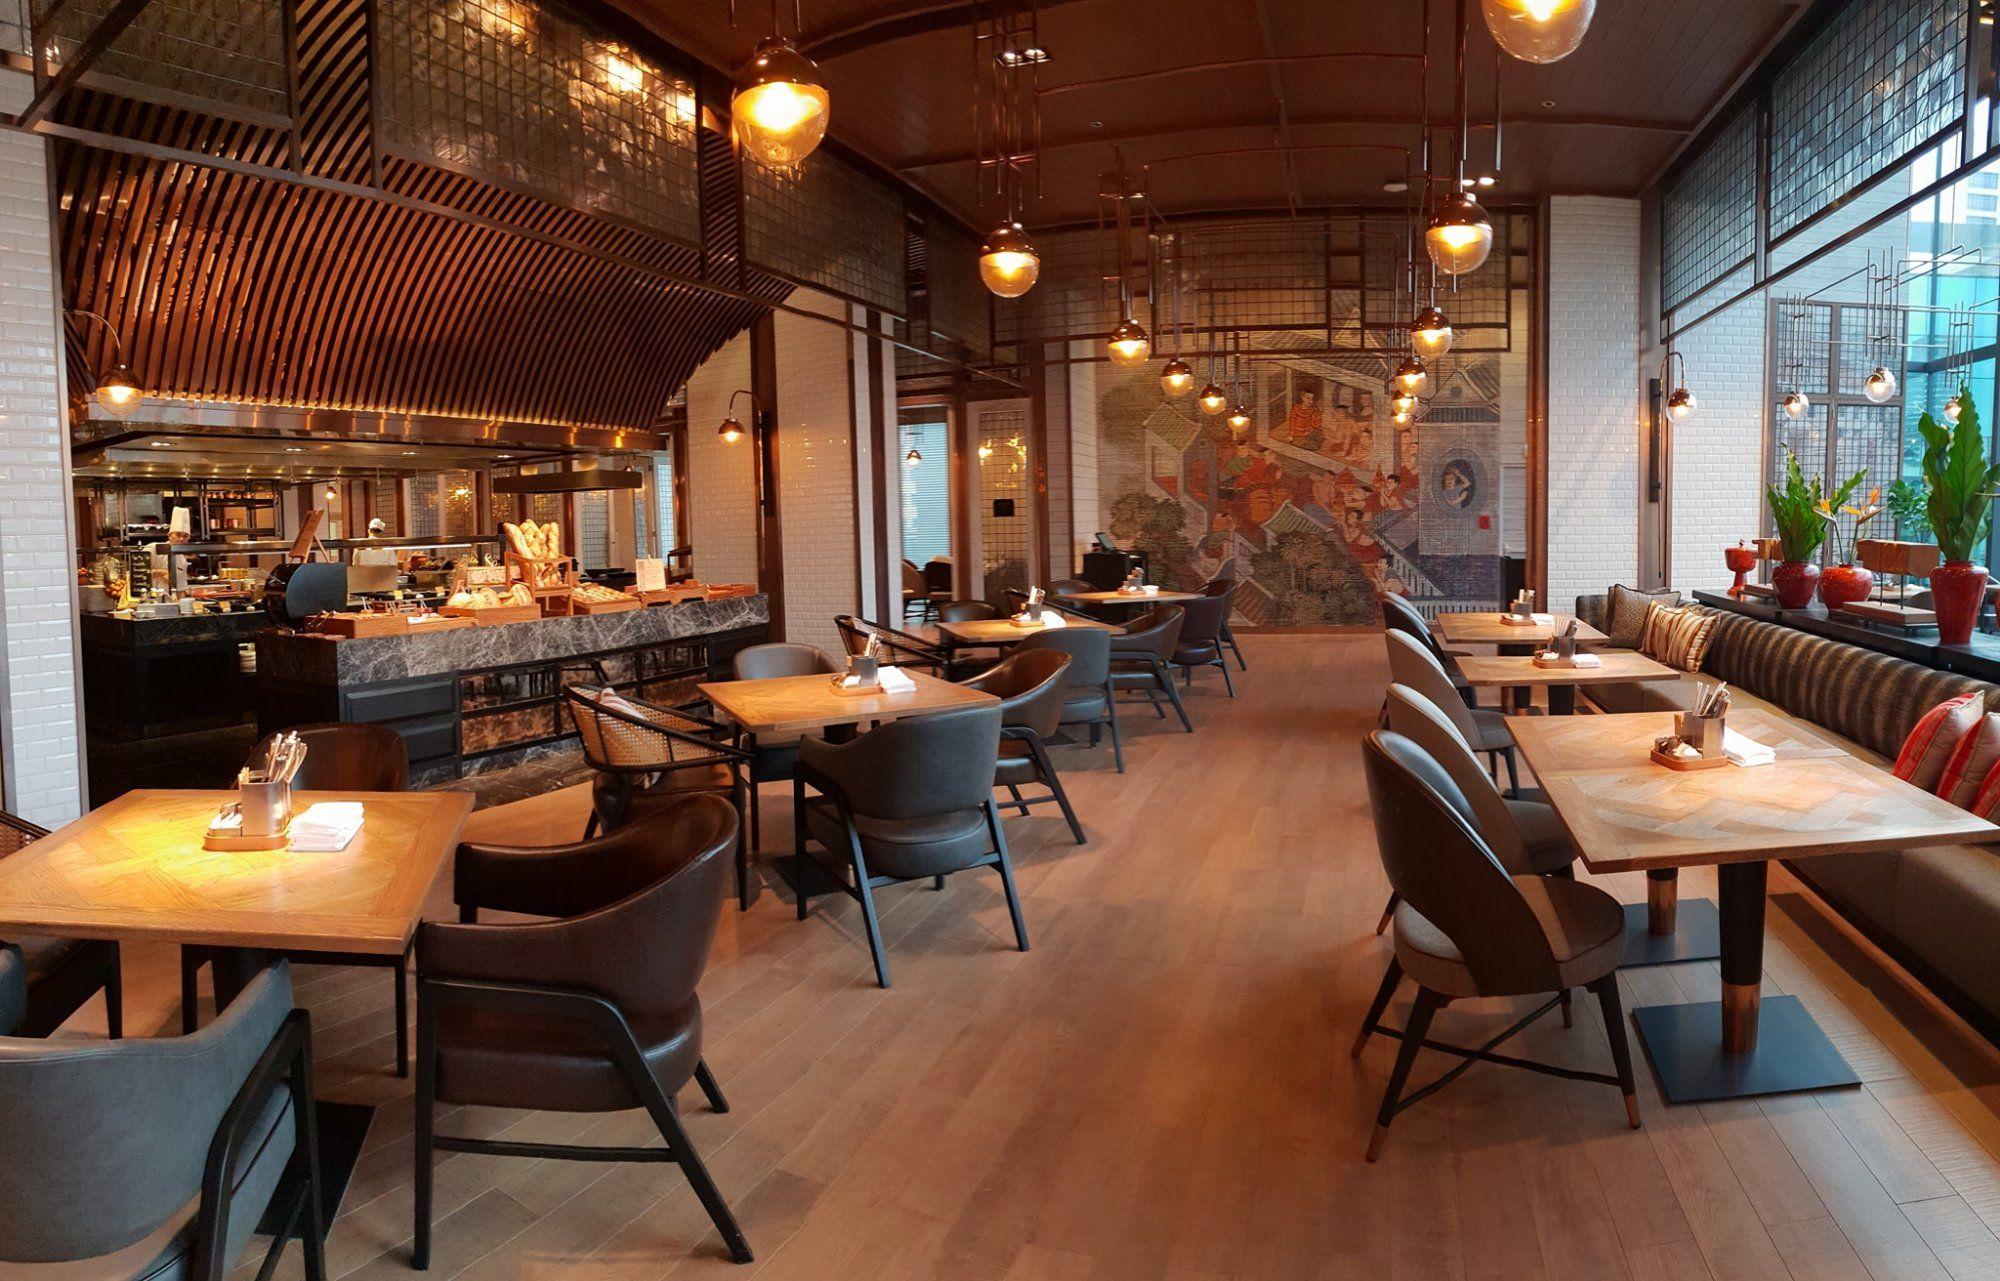 Bangkok Marriott Hotel The Surawongse: UPDATED 2018 Reviews